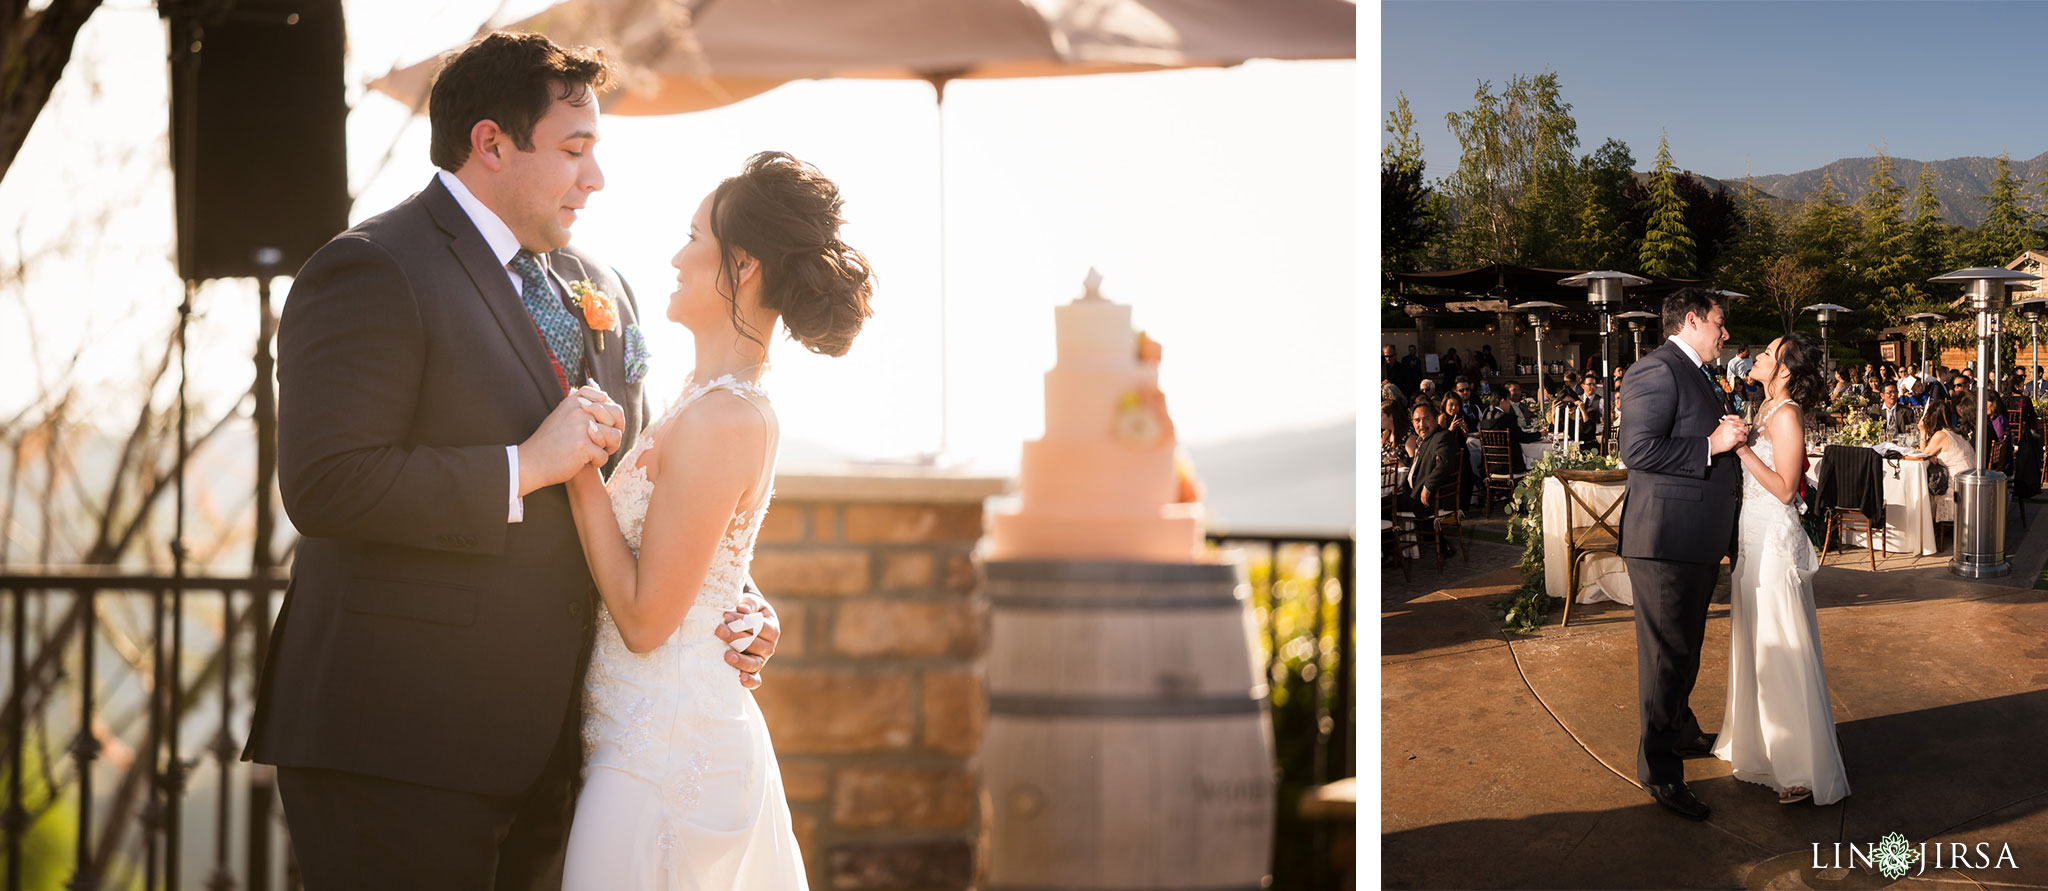 28 serendipity gardens oak glen wedding reception photography